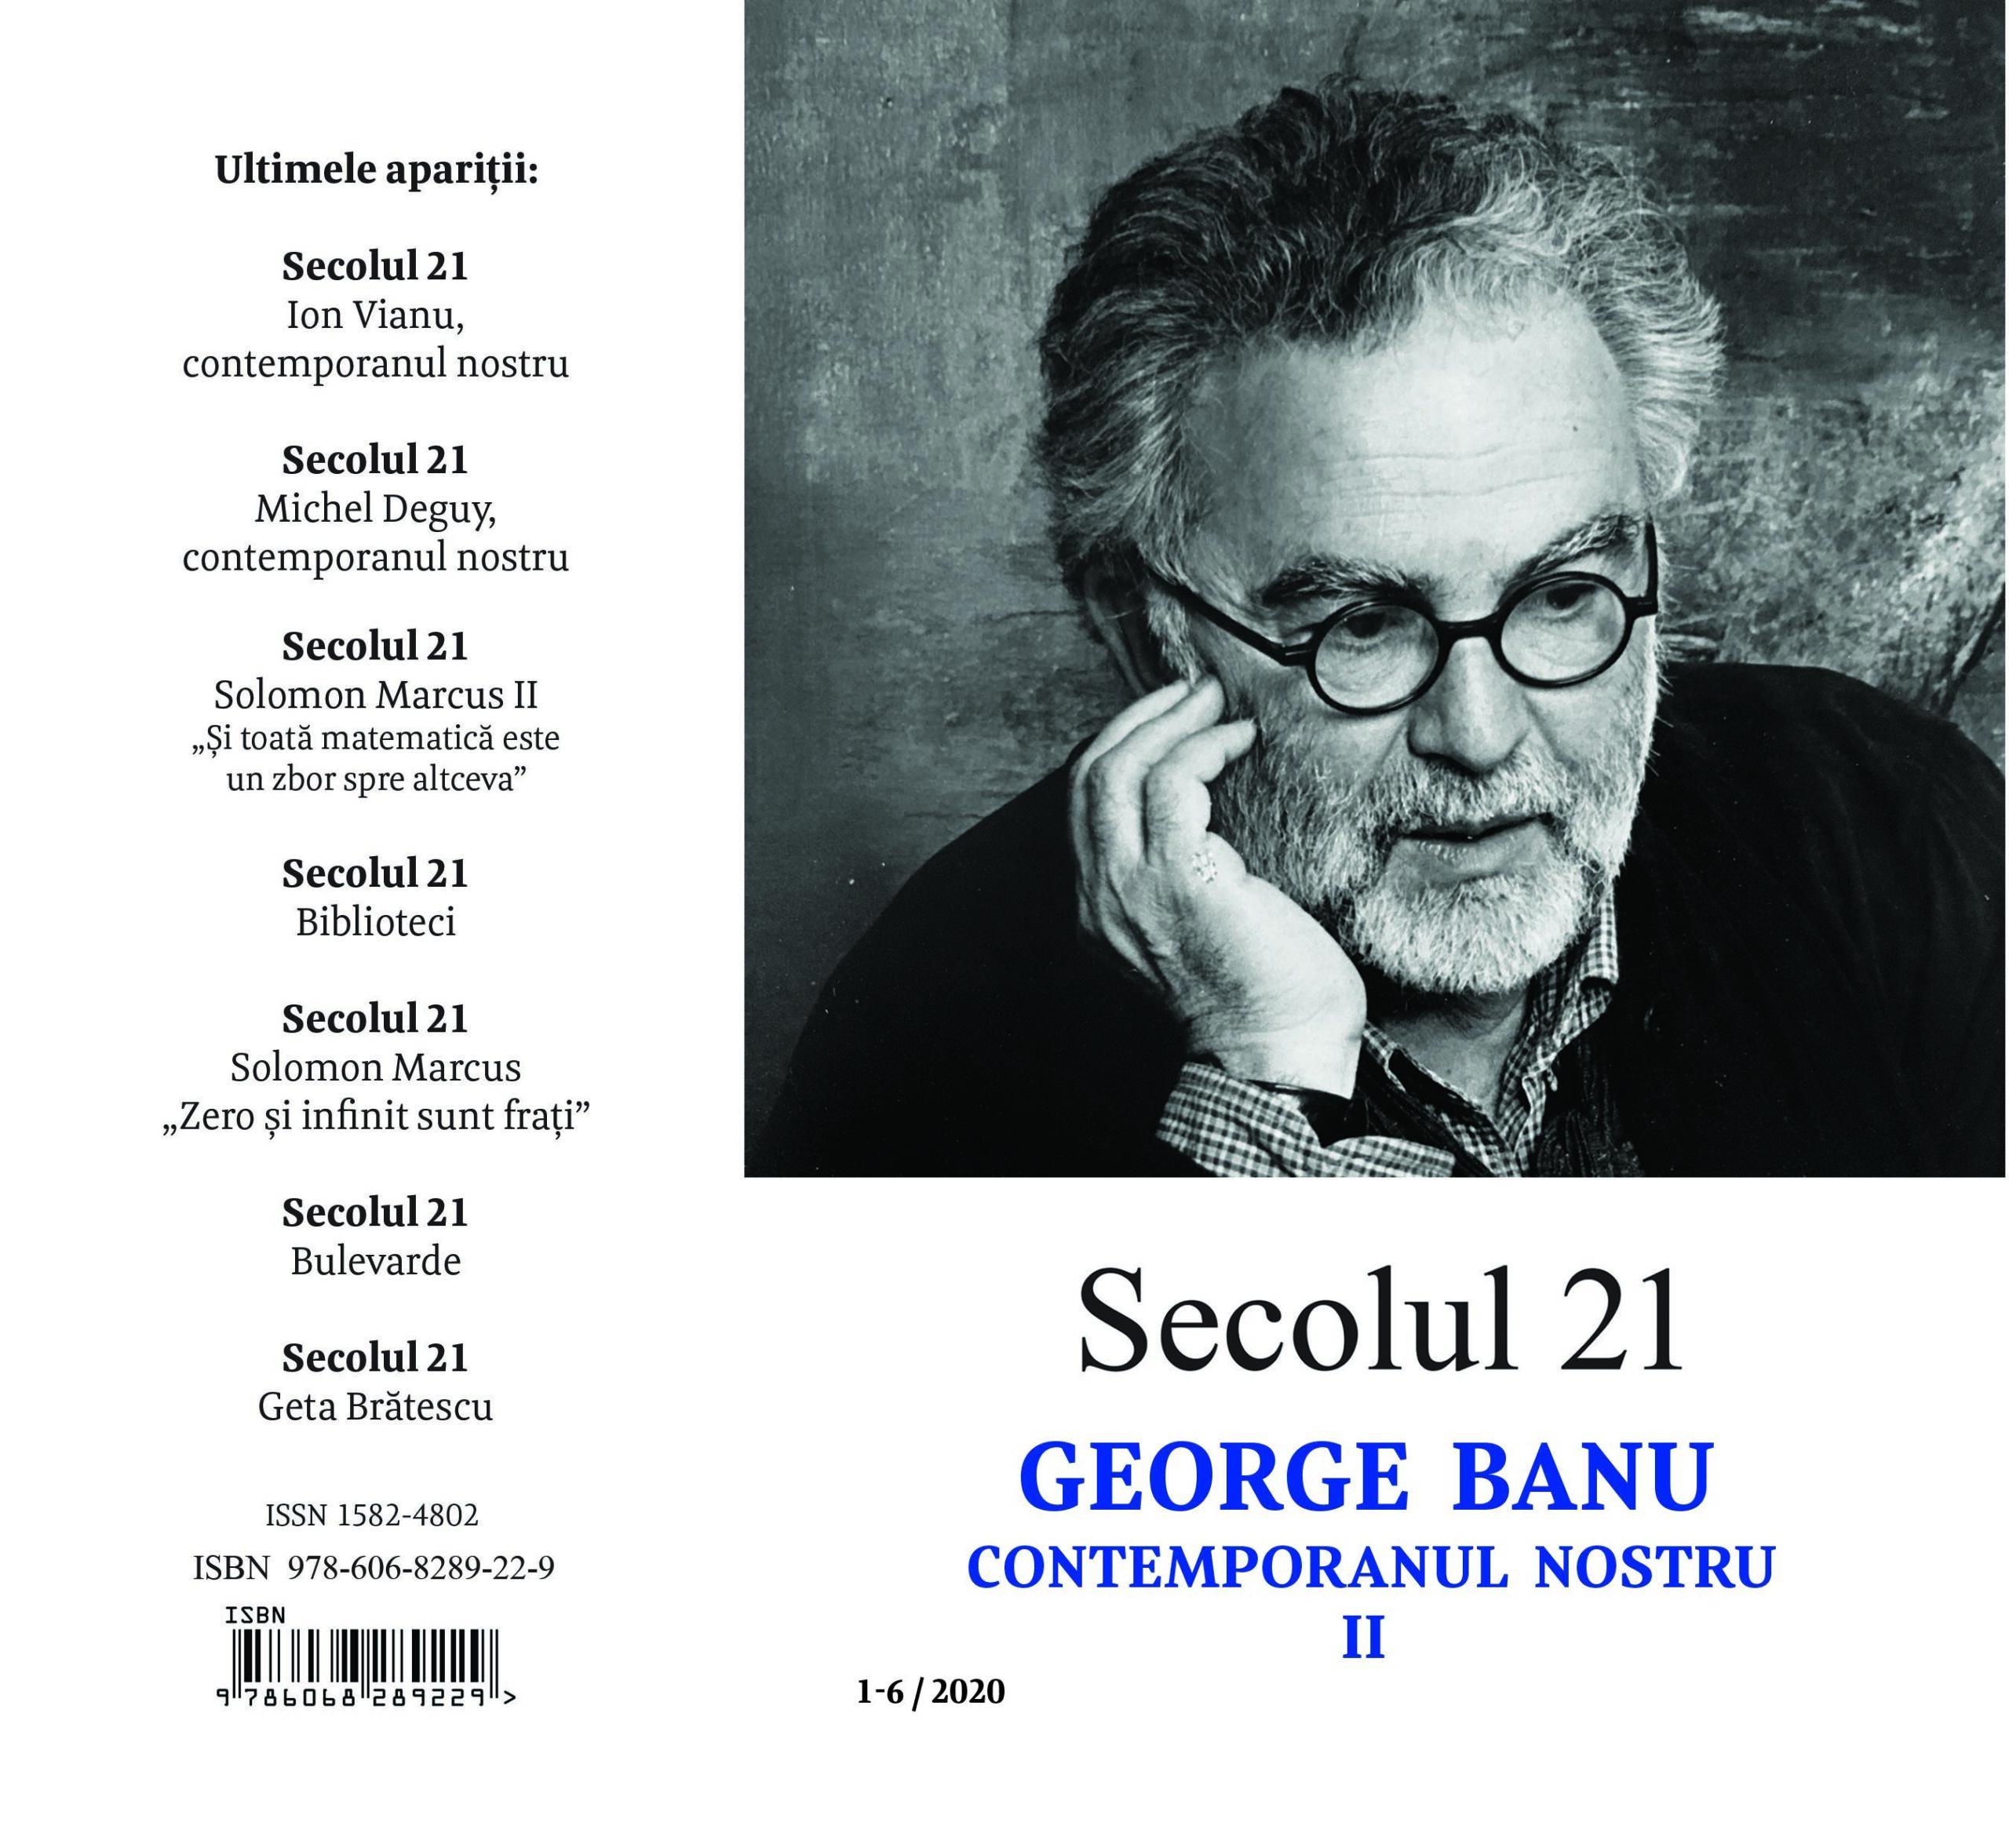 Secolul 21 - GEORGE BANU I 7-12/2019 coperta 4